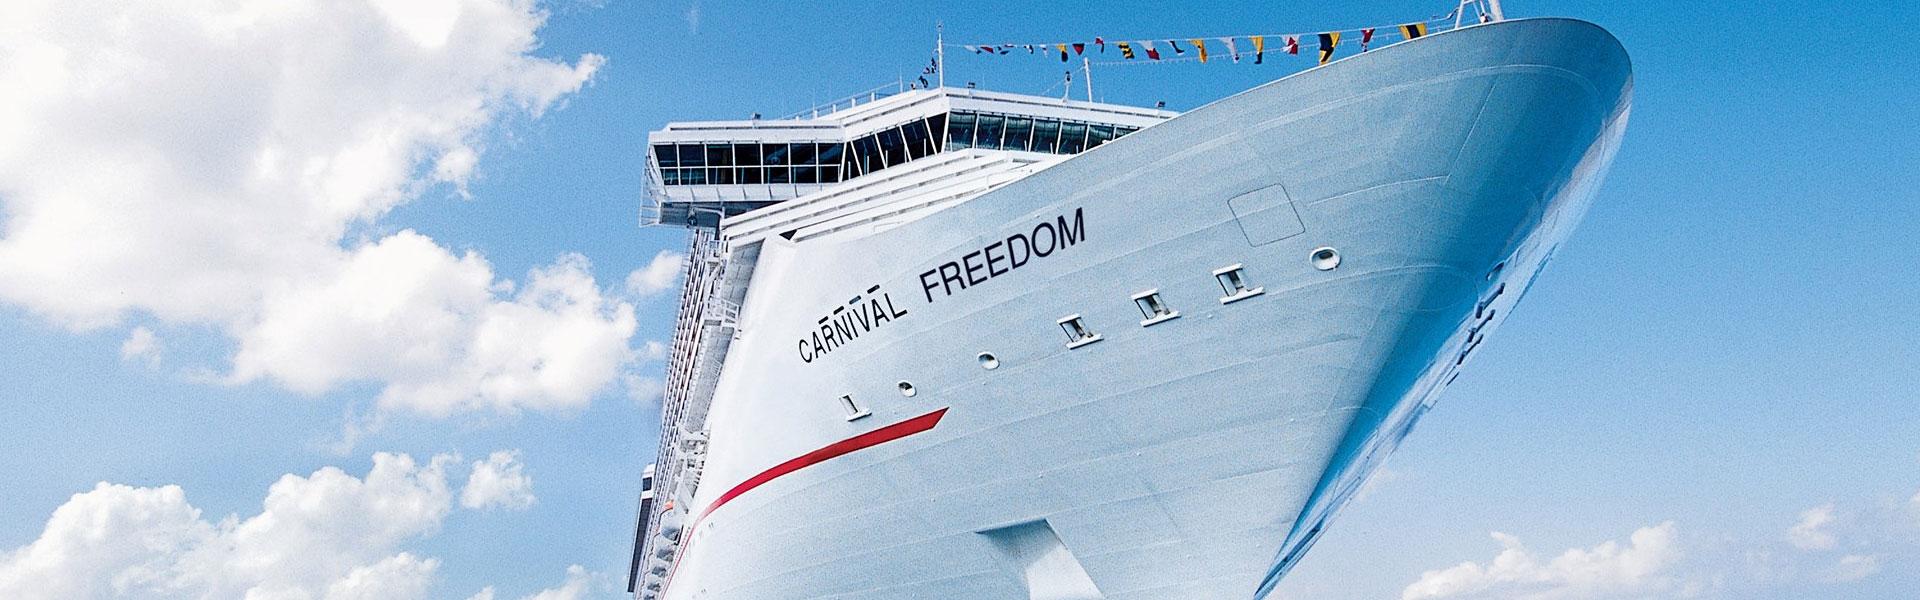 Carnival Freedom at Sea